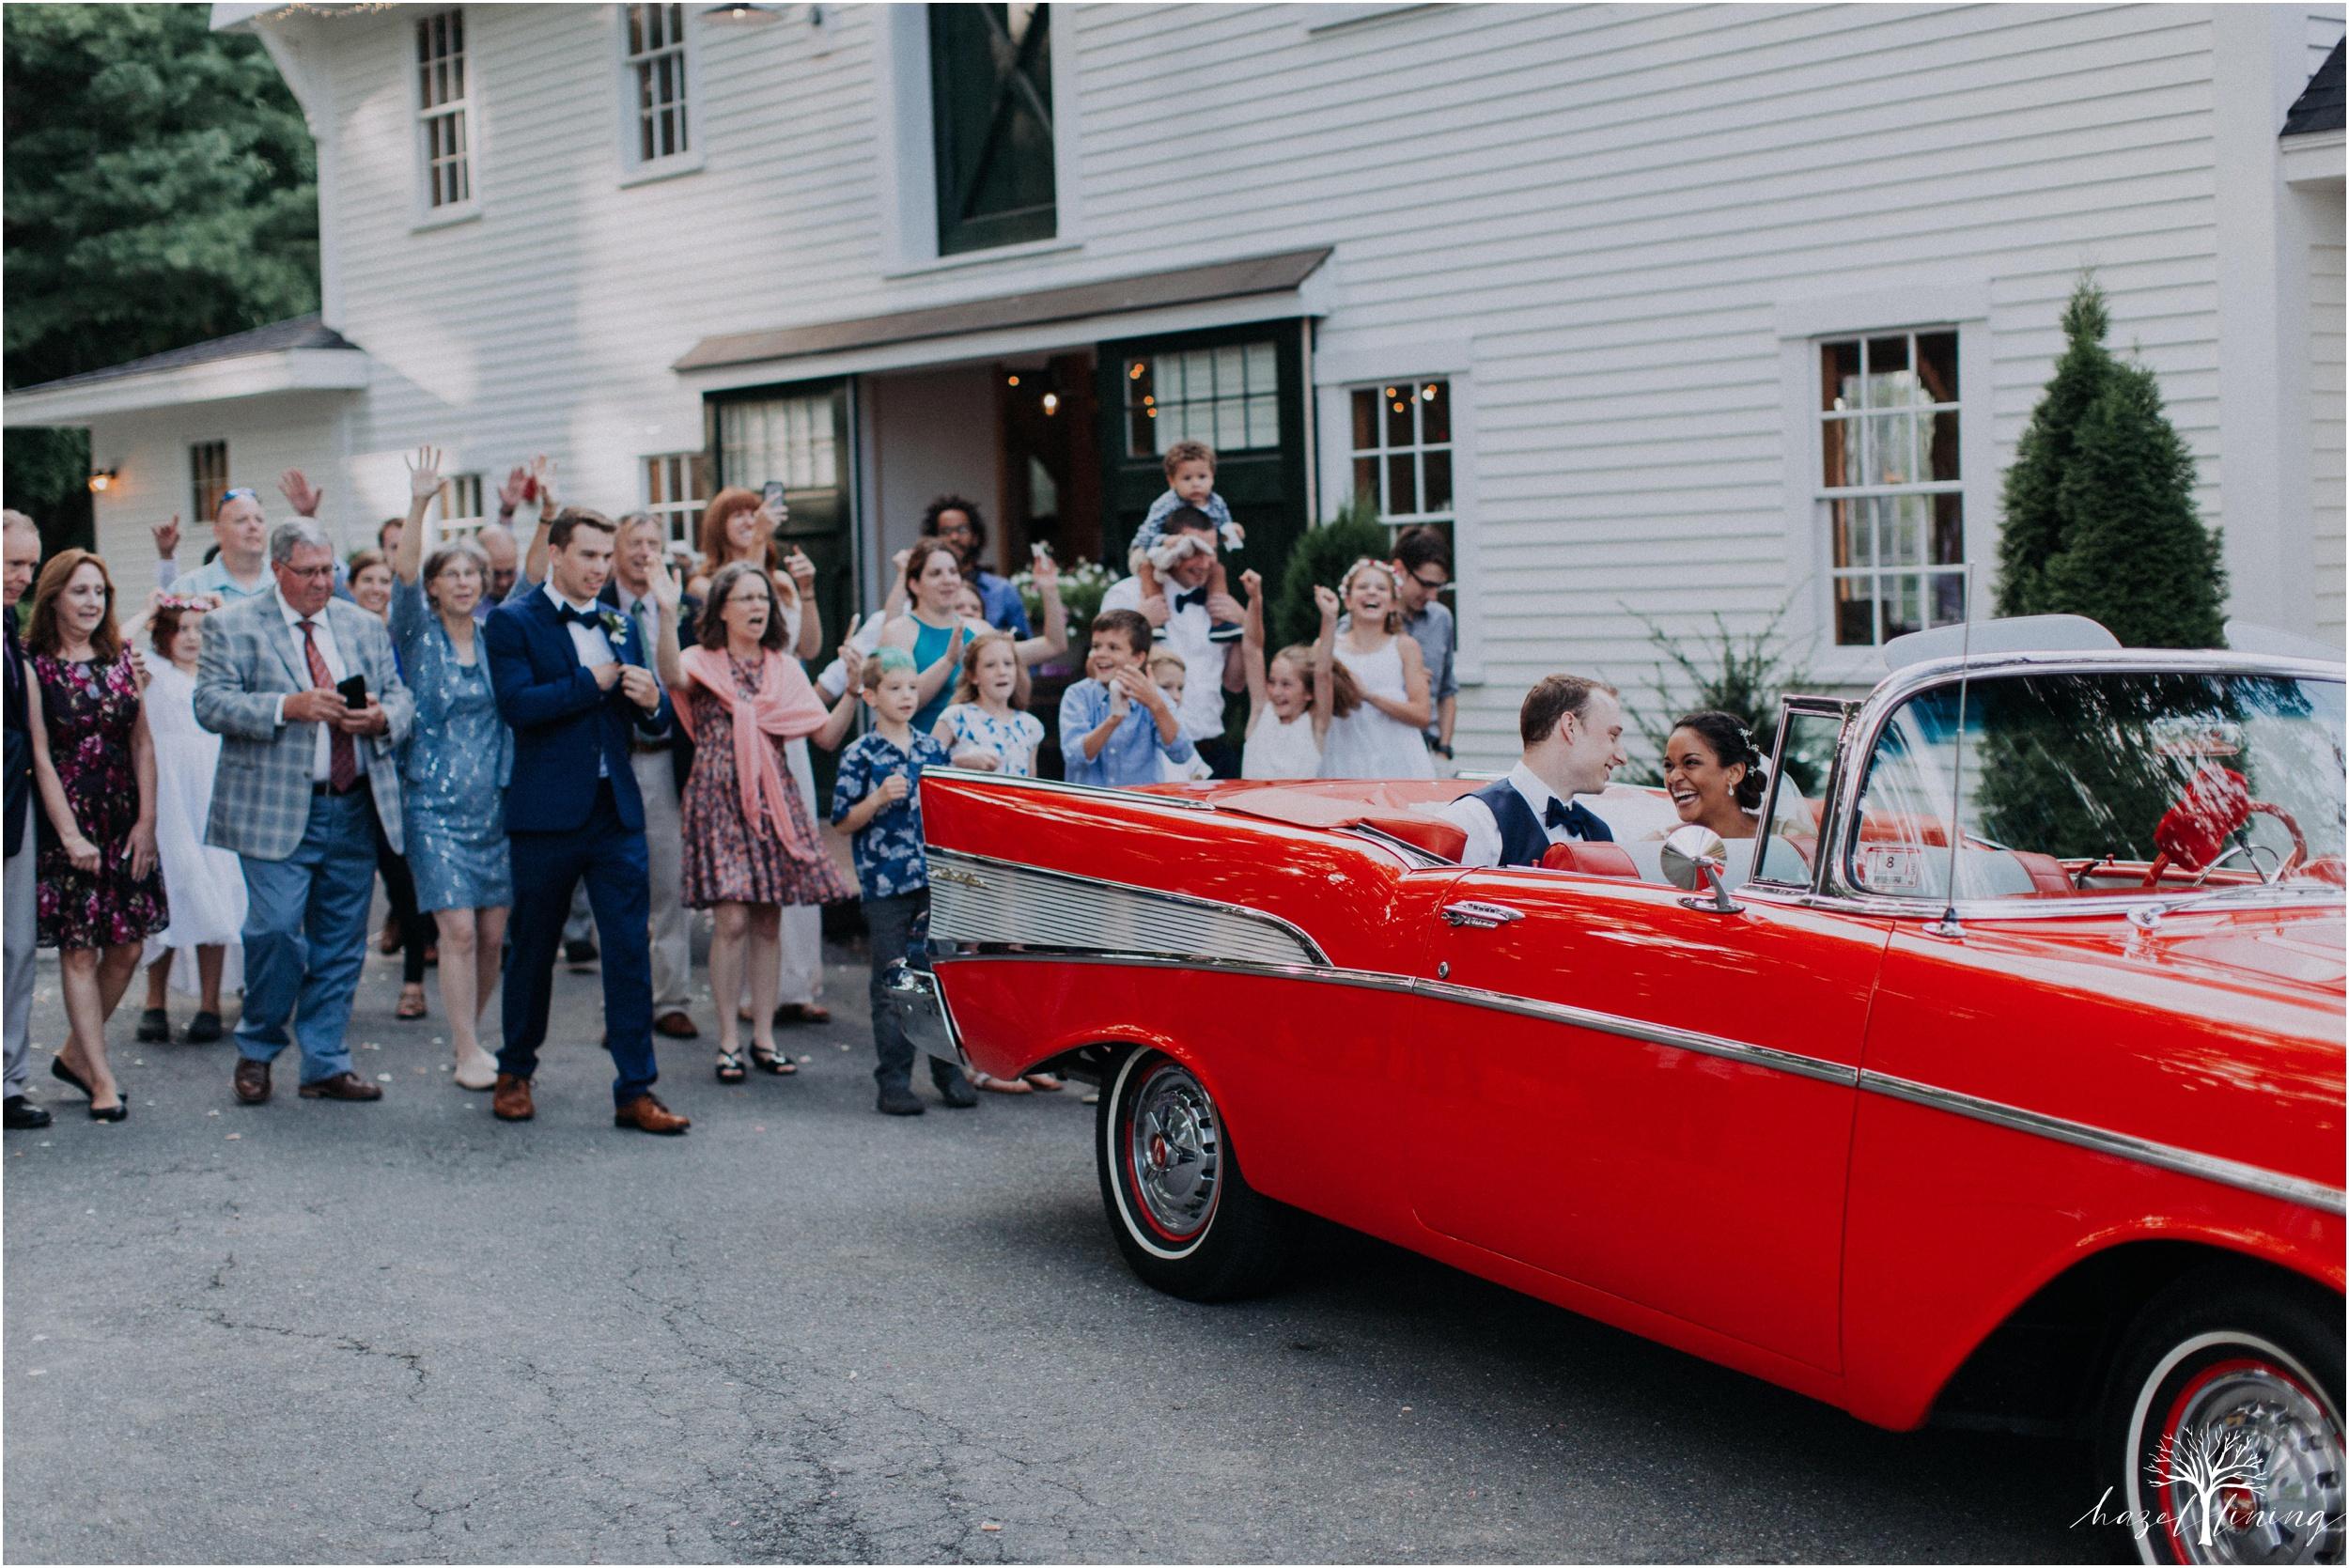 mariah-kreyling-samuel-sherratt-sherrattwiththeworld-peirce-farm-at-witch-hill-boston-massachusetts-wedding-photography-hazel-lining-travel-wedding-elopement-photography_0210.jpg